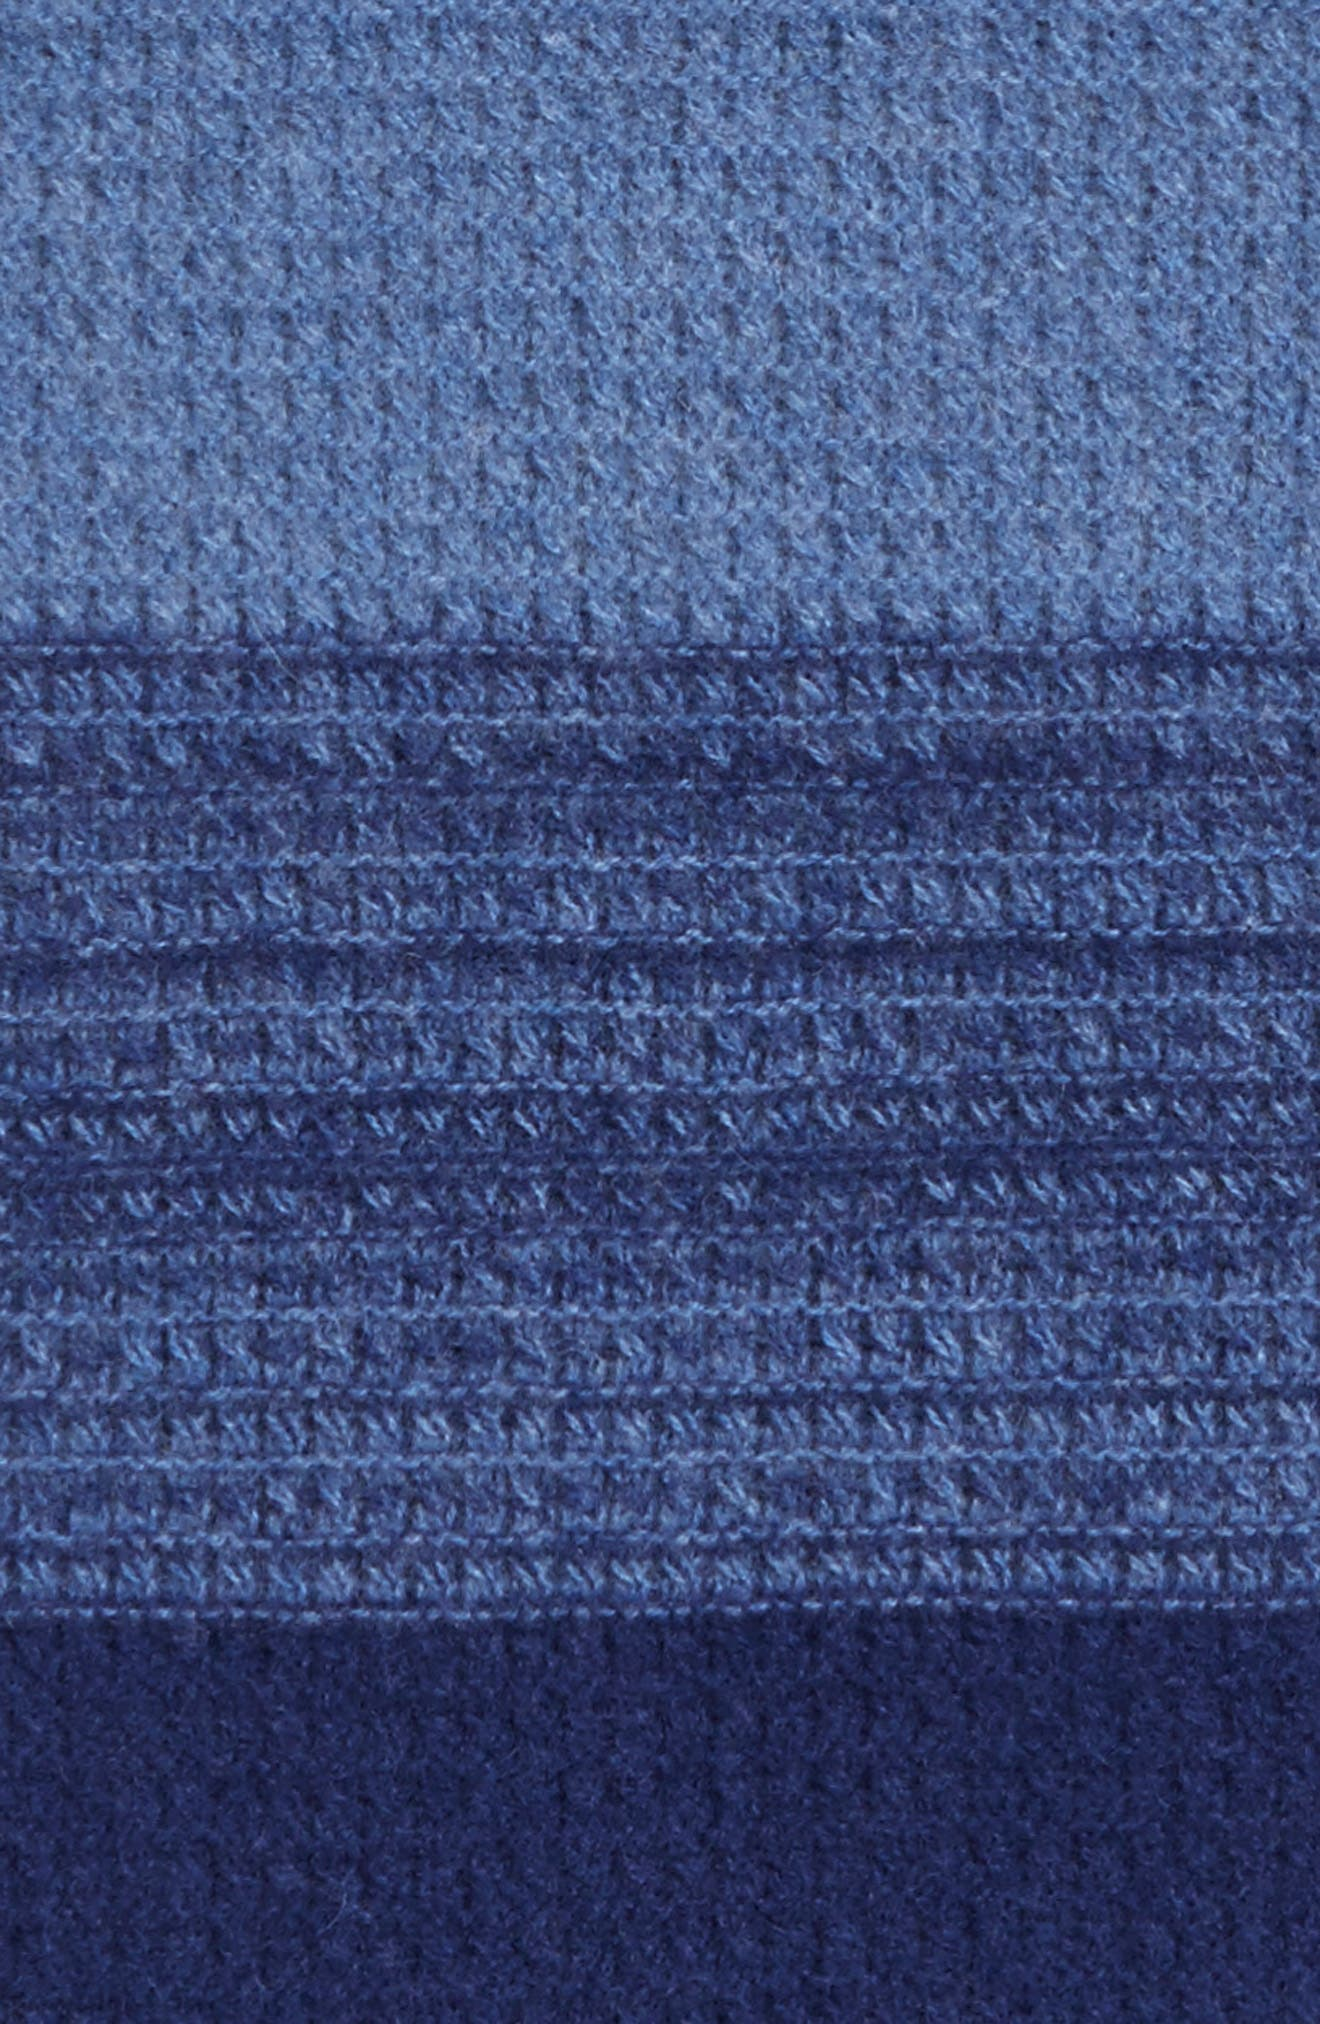 Ombré Cashmere Infinity Scarf,                             Alternate thumbnail 15, color,